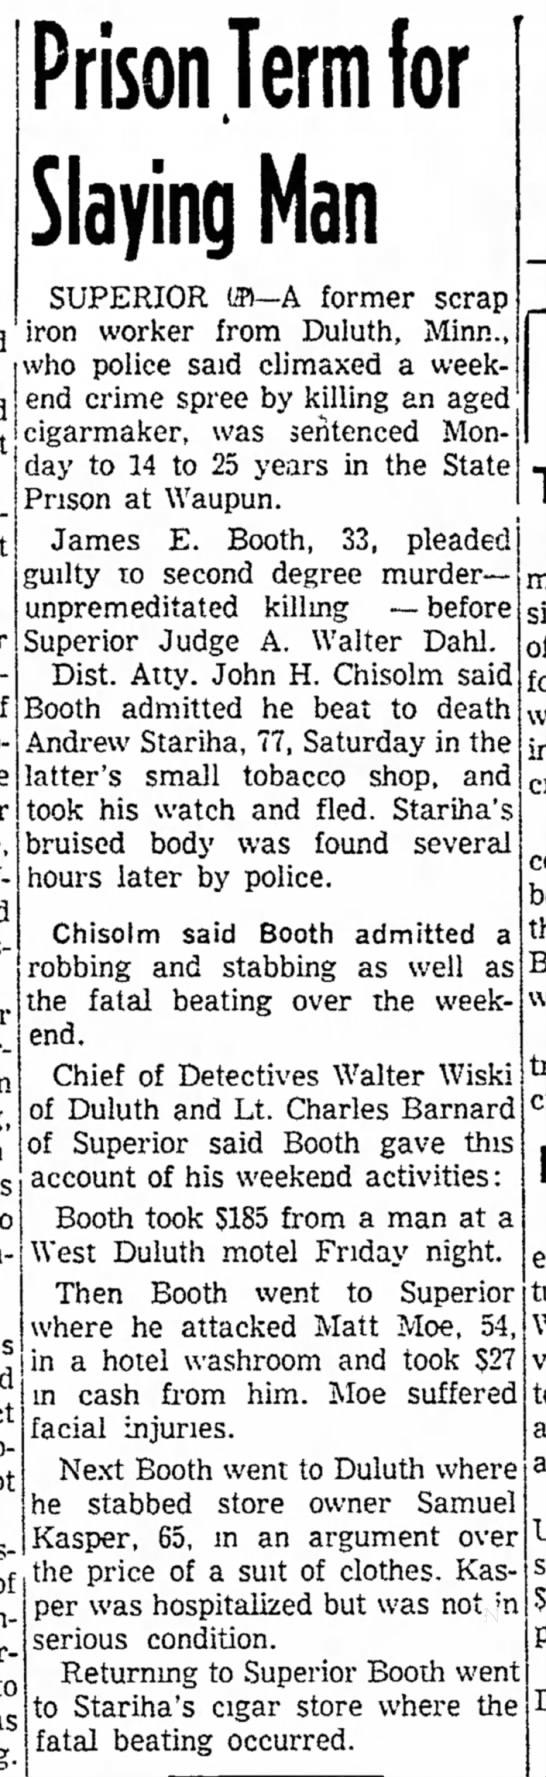 Waukesha Daily Freeman, Waukesha, WI Feb. 16, 1954; page 2.